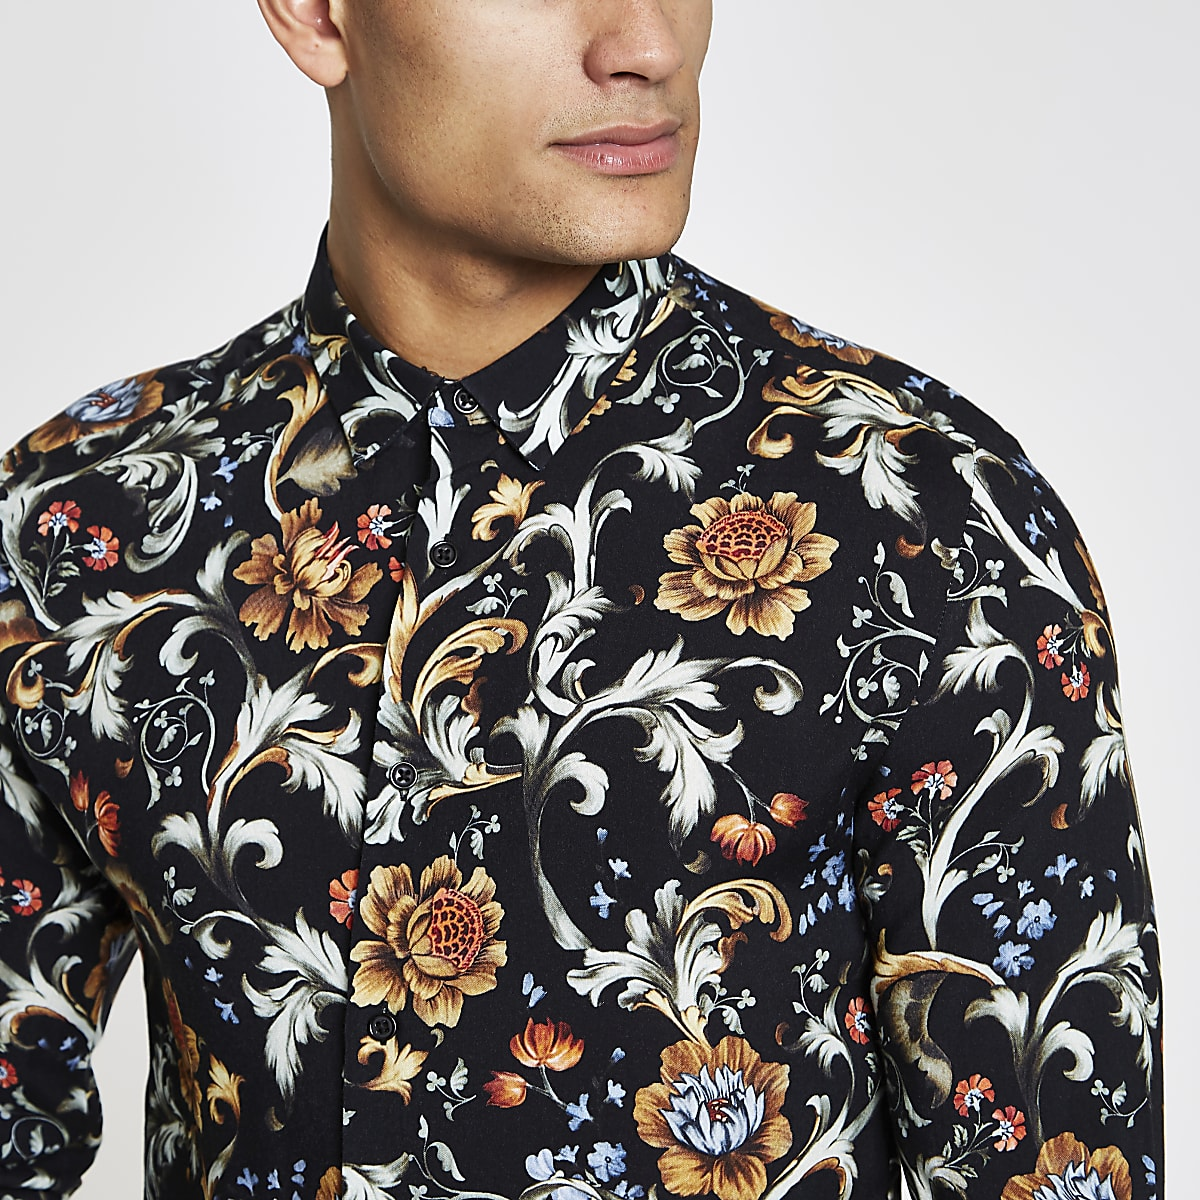 Jaded London black floral long sleeve shirt